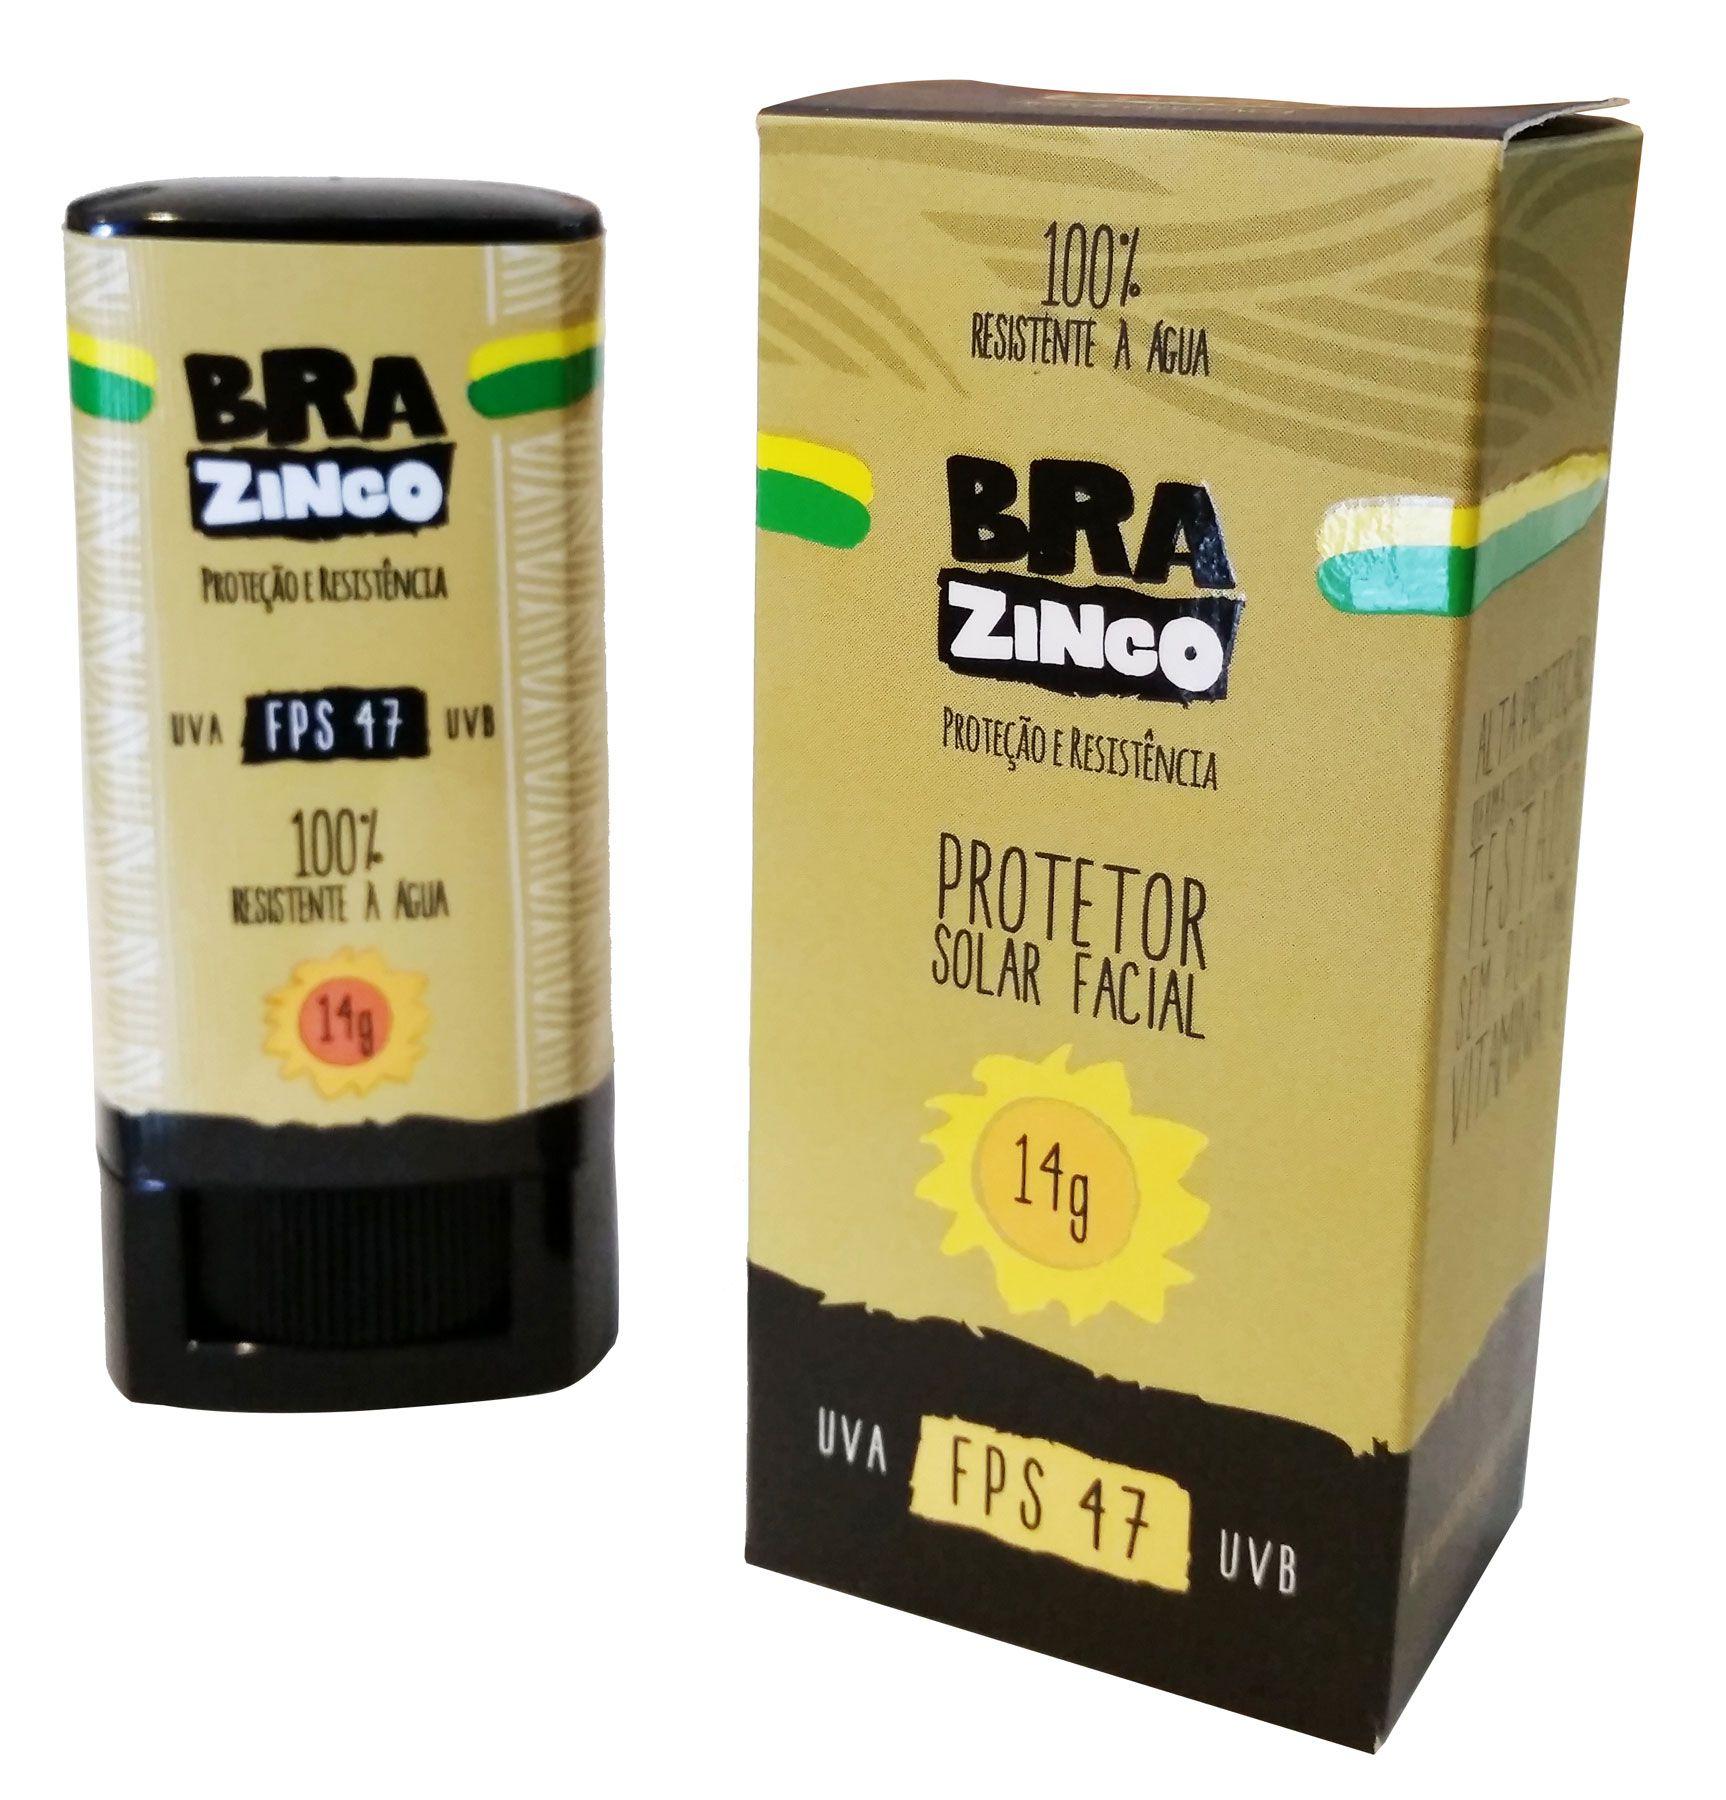 Protetor Solar Brazinco 14g